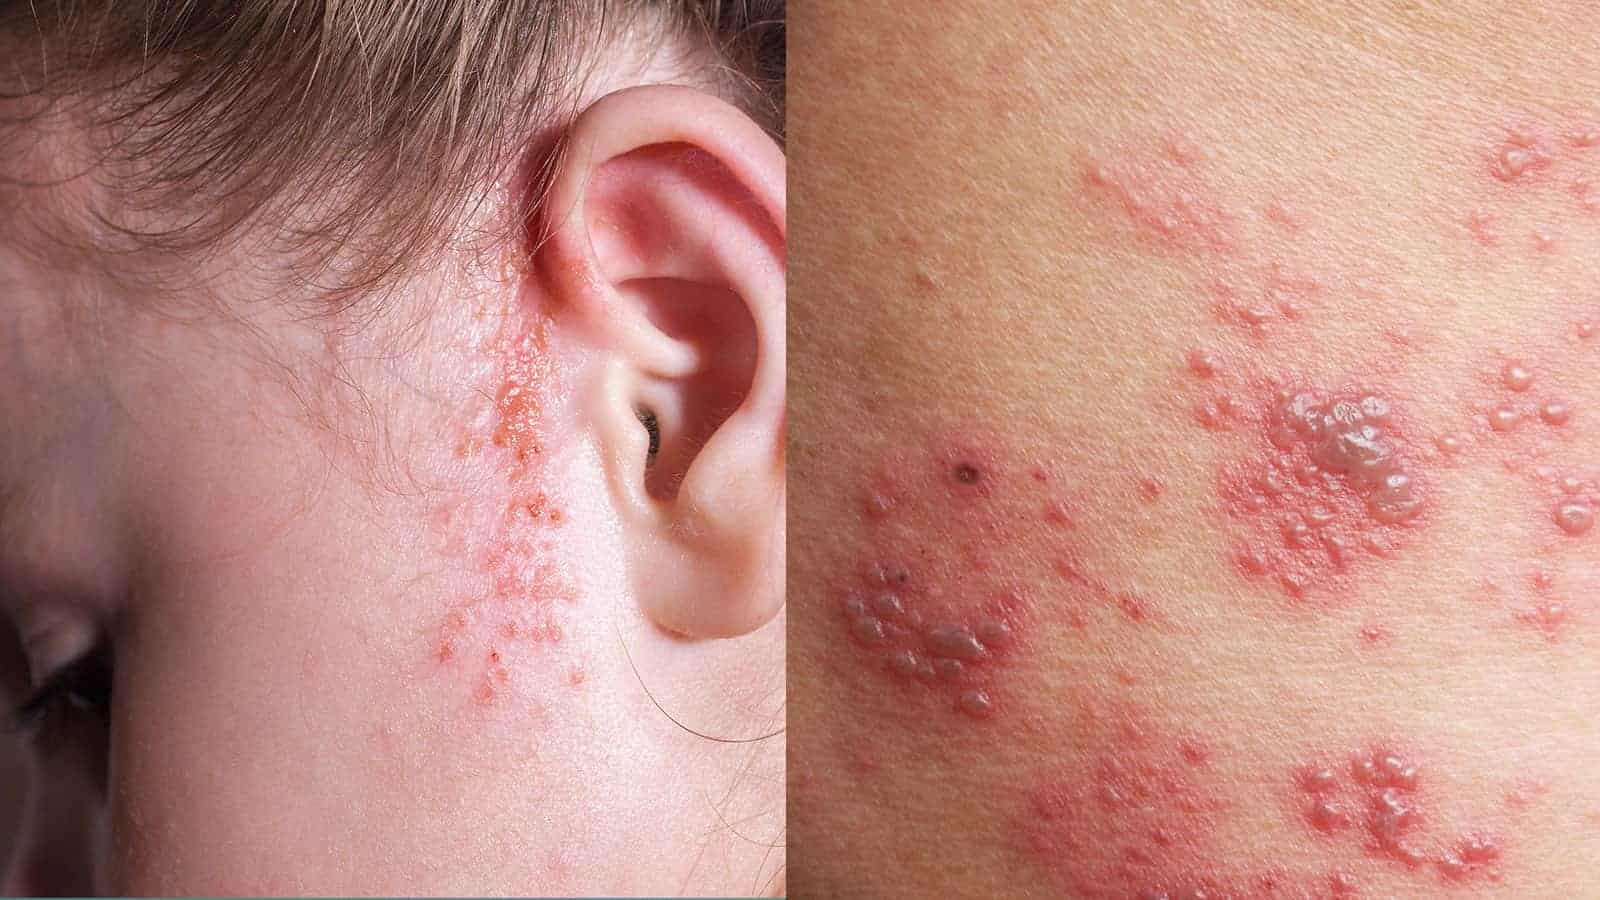 dermatologic disease